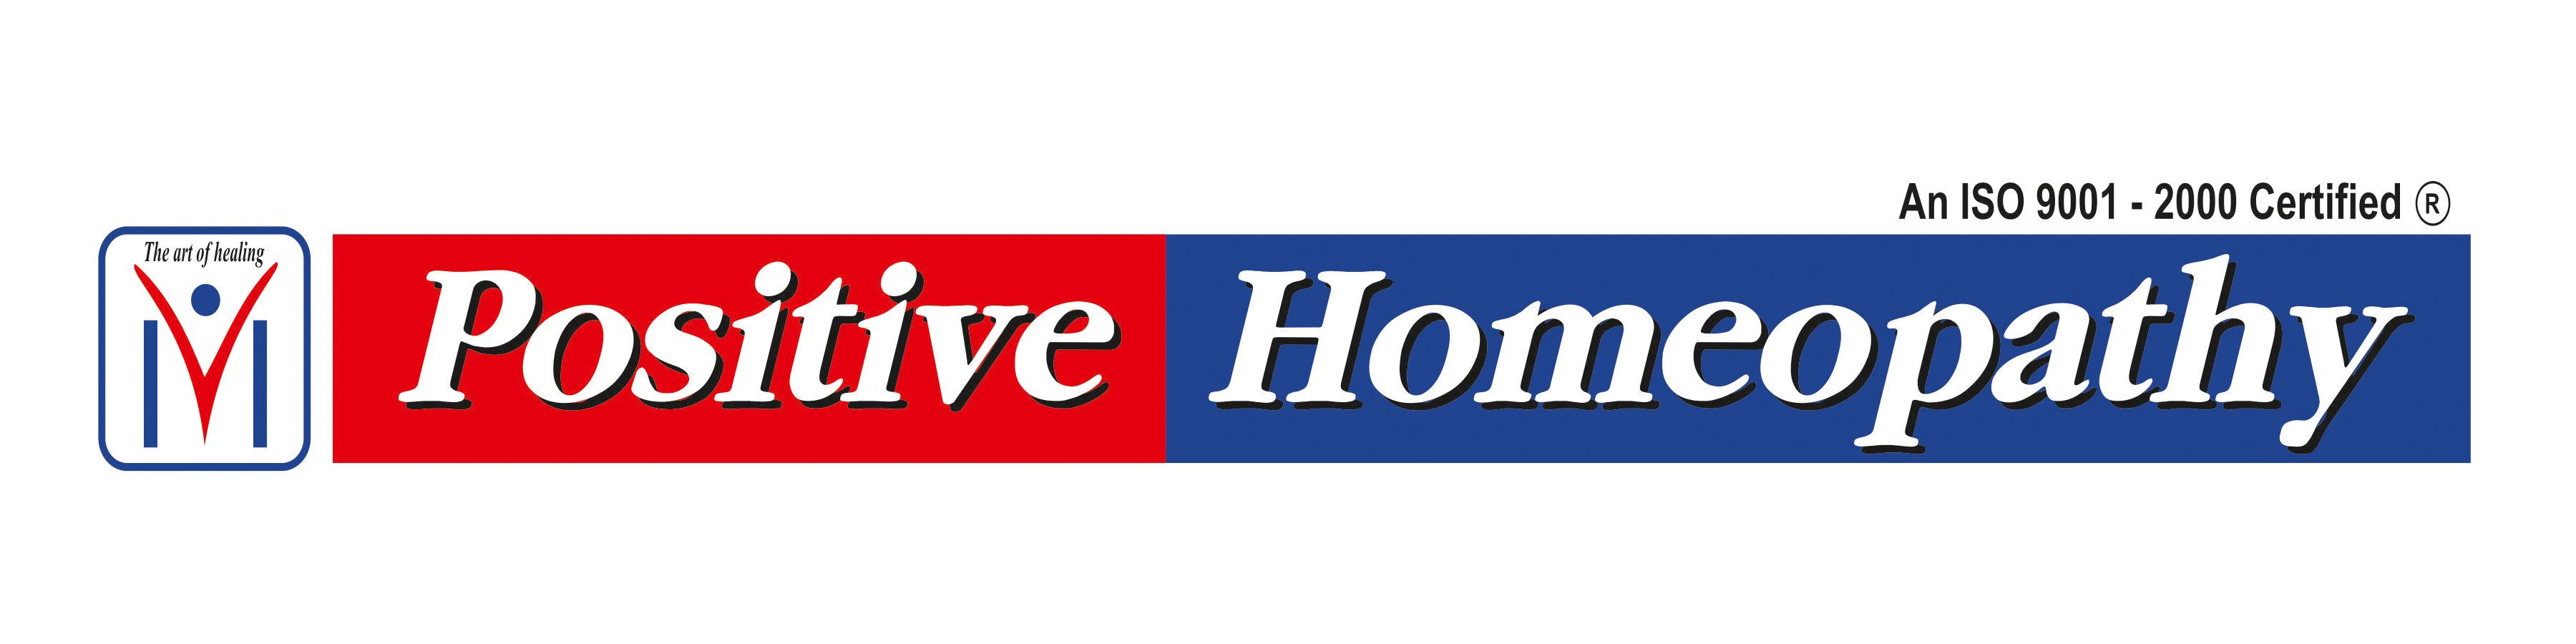 Positive Homeopathy - Jayanagar - Bangalore Image